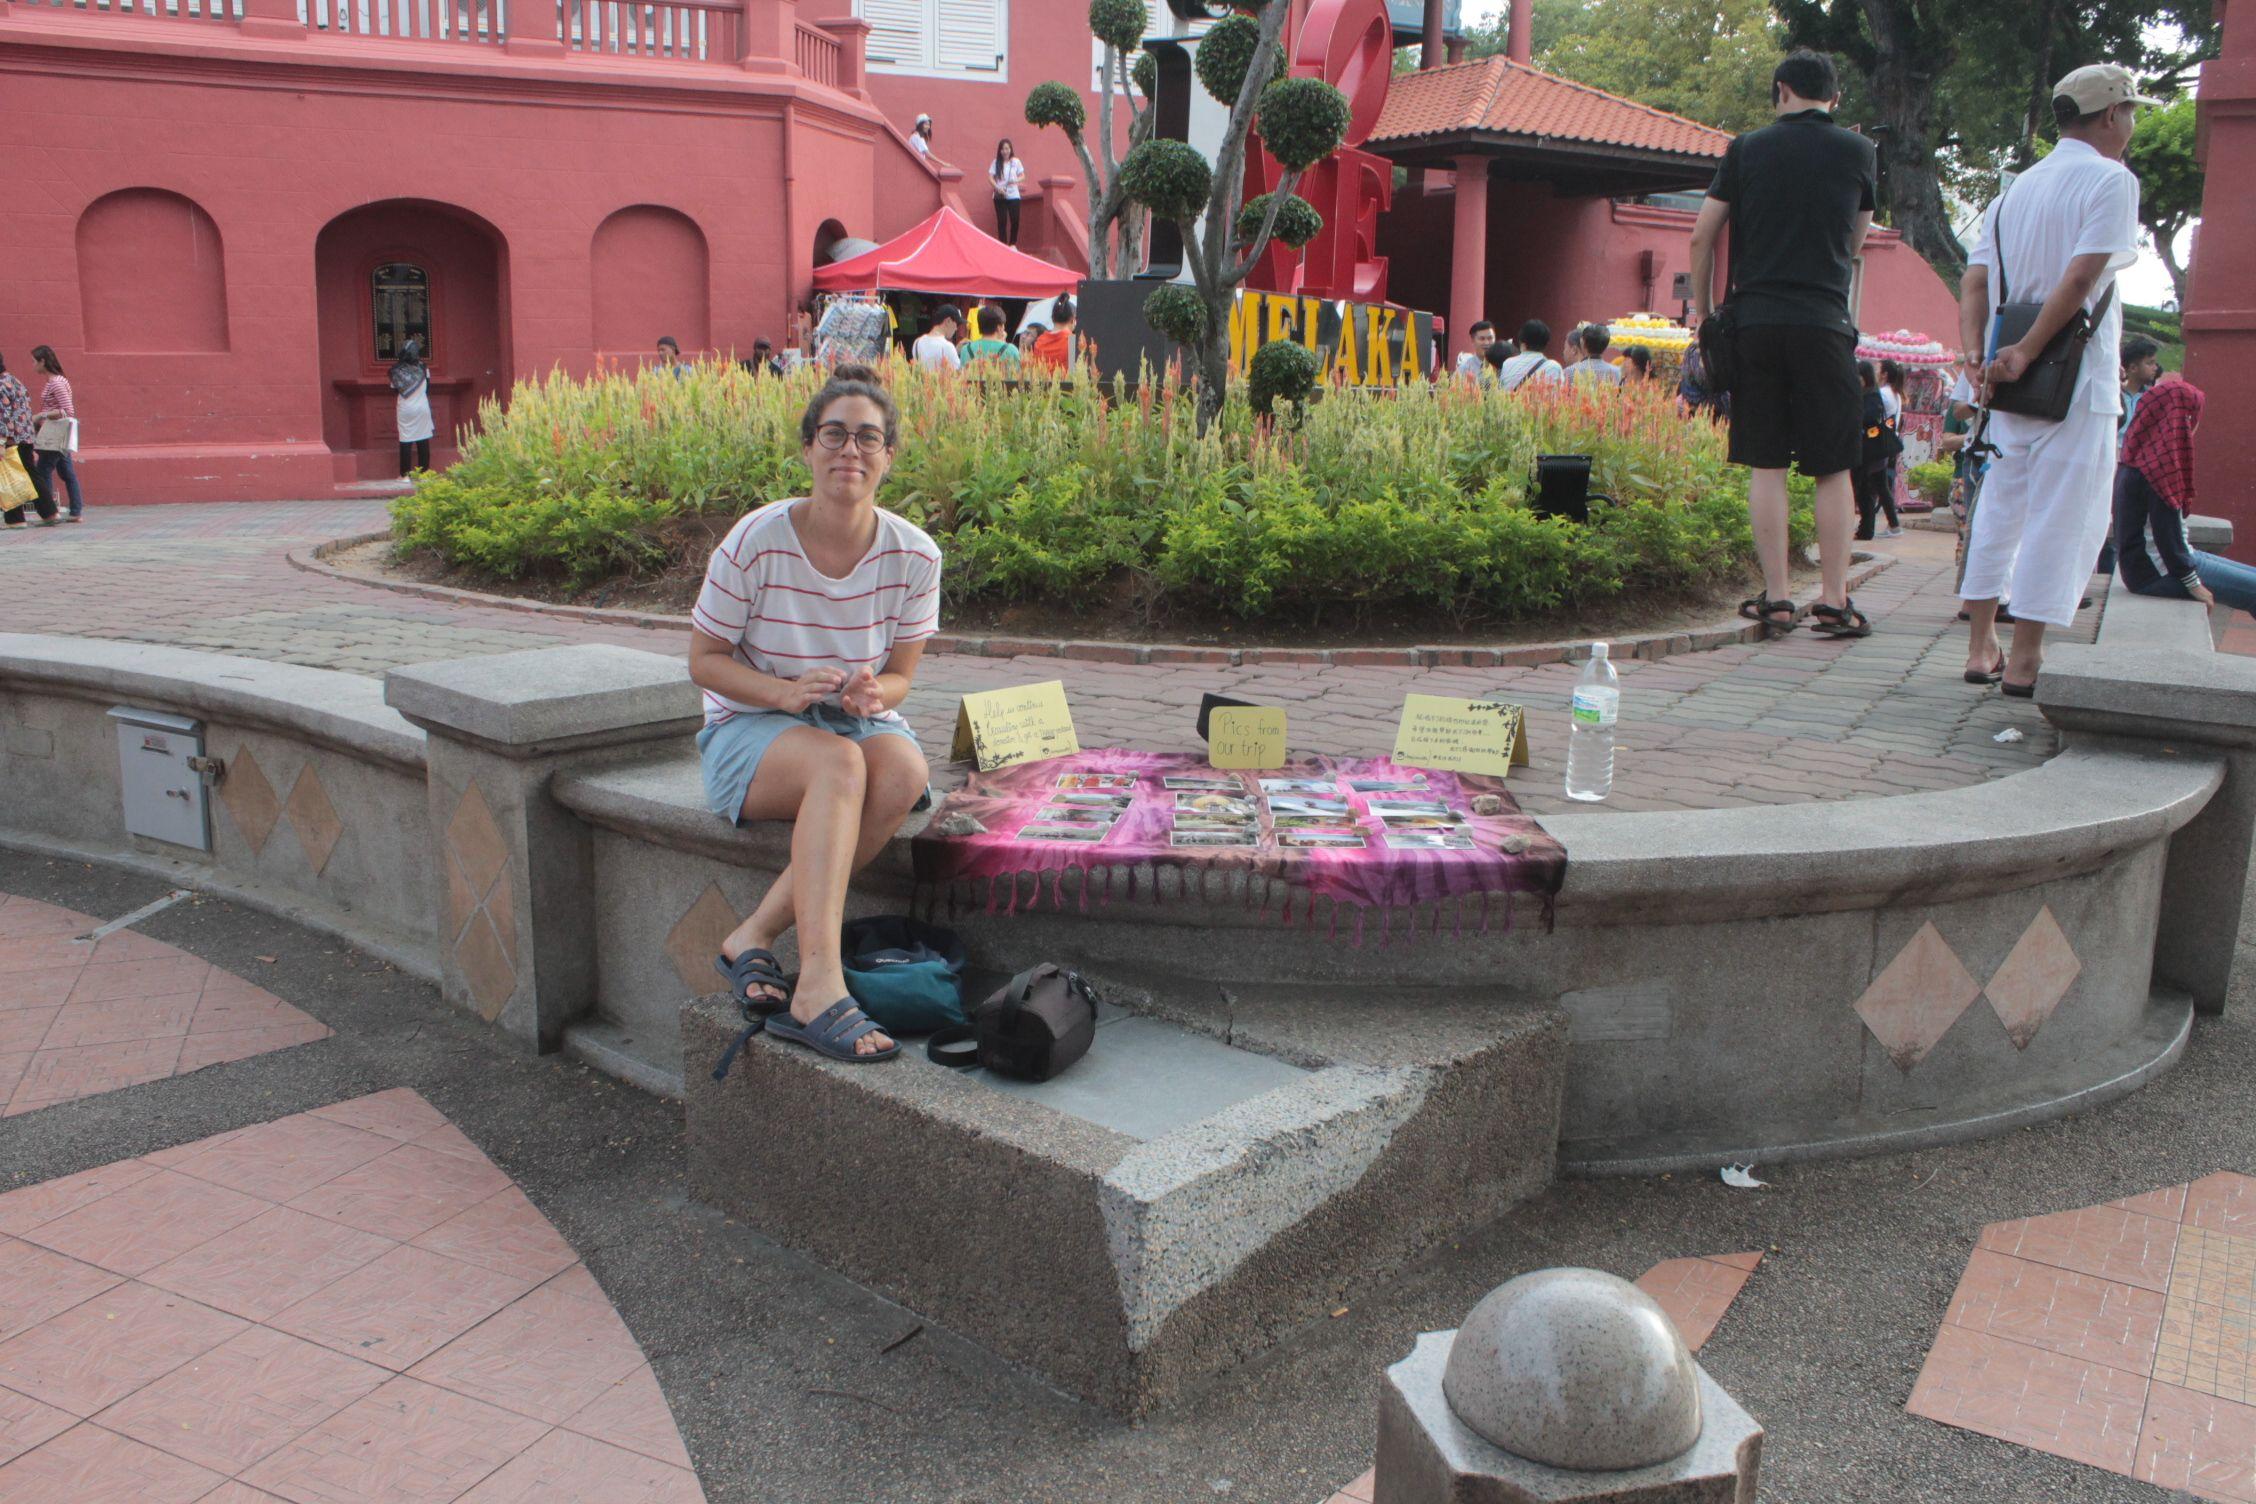 Vendiendo postales en la plaza